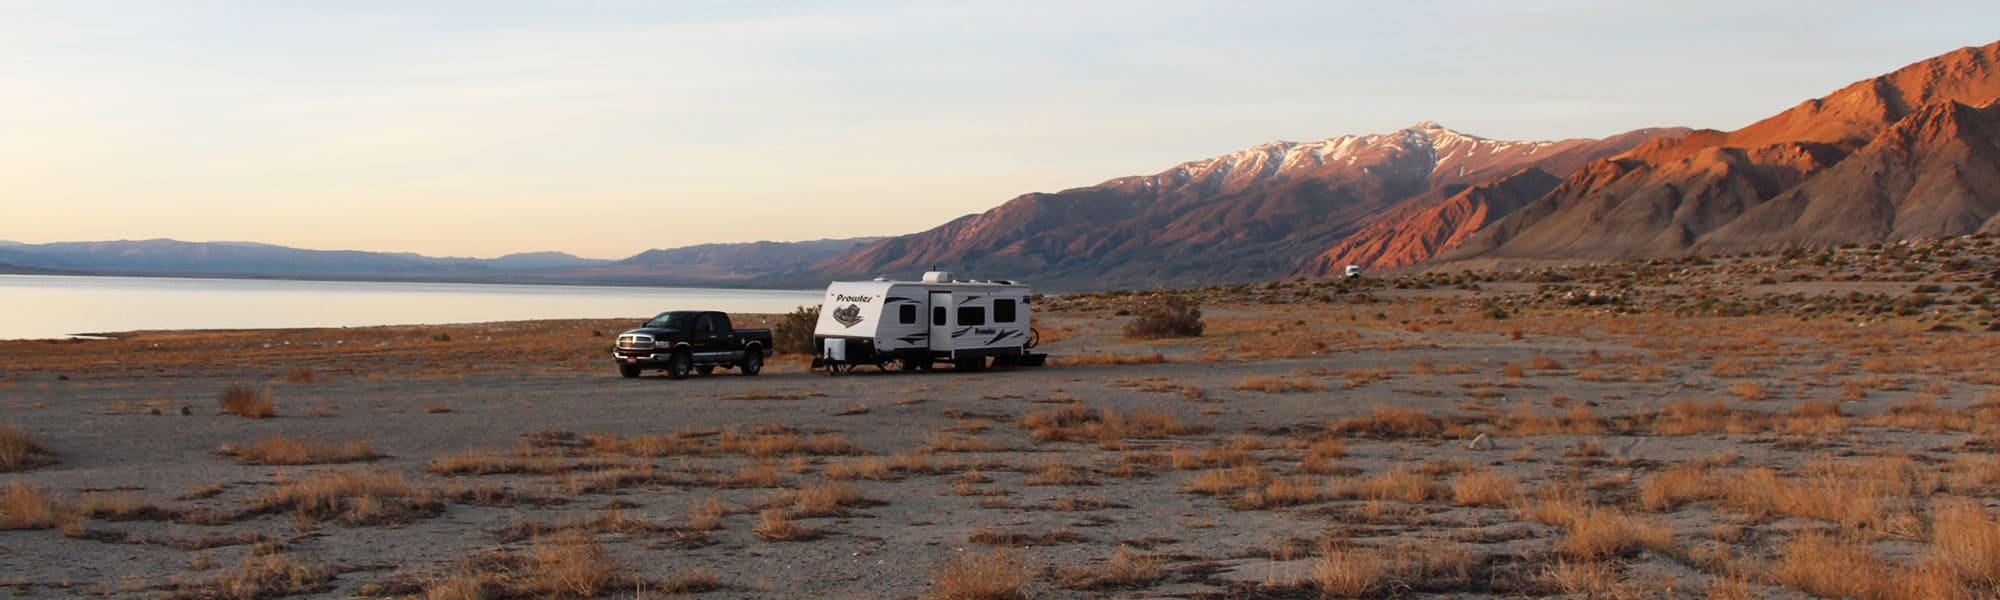 twenty-mile-beach-walker-lake-nevada-camping-review-info